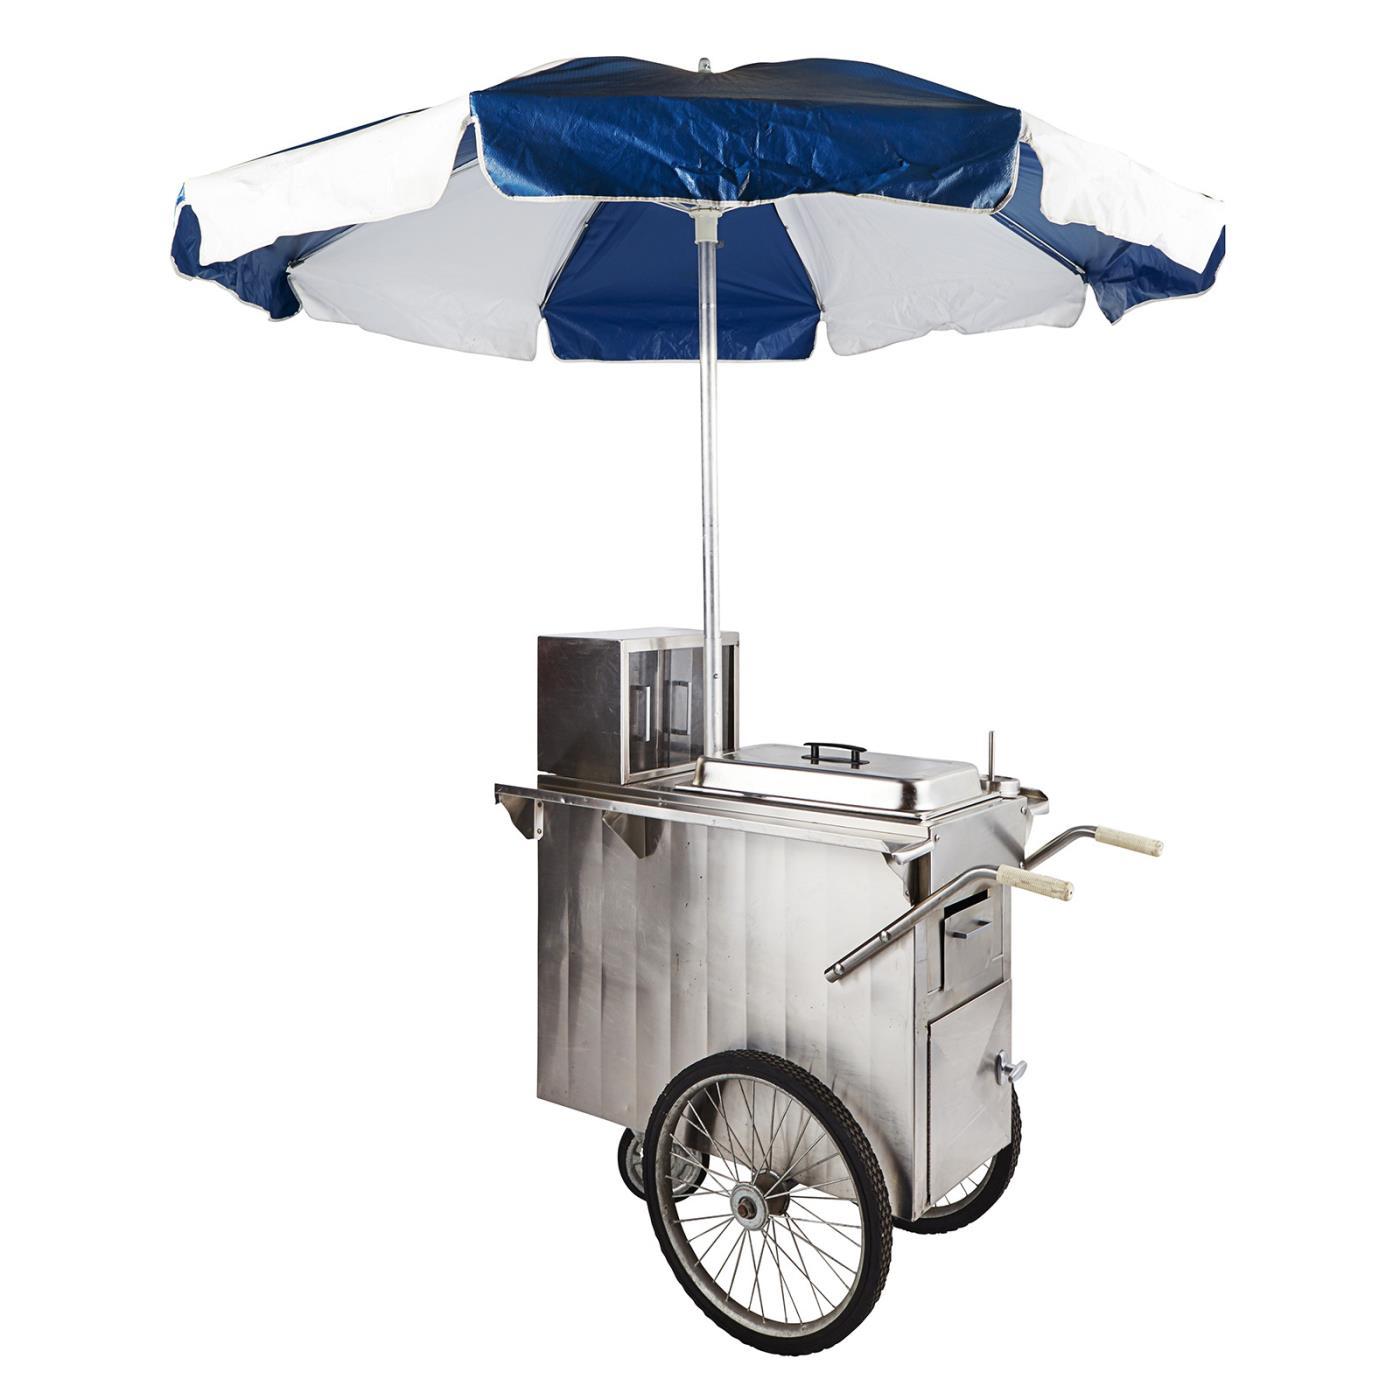 Hot Dog Cart Umbrella for Rent NYC | SDPR